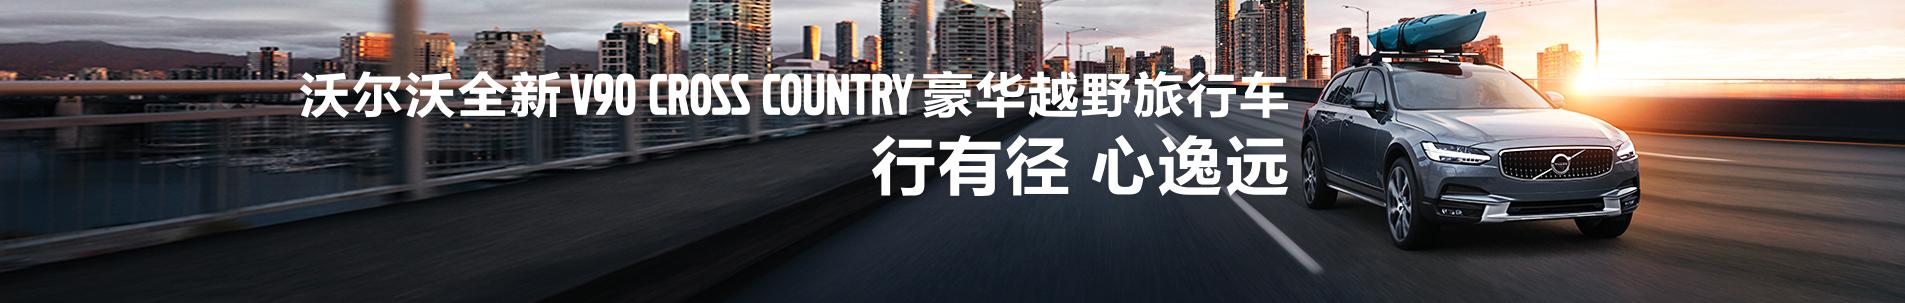 沃尔沃汽车中国 banner